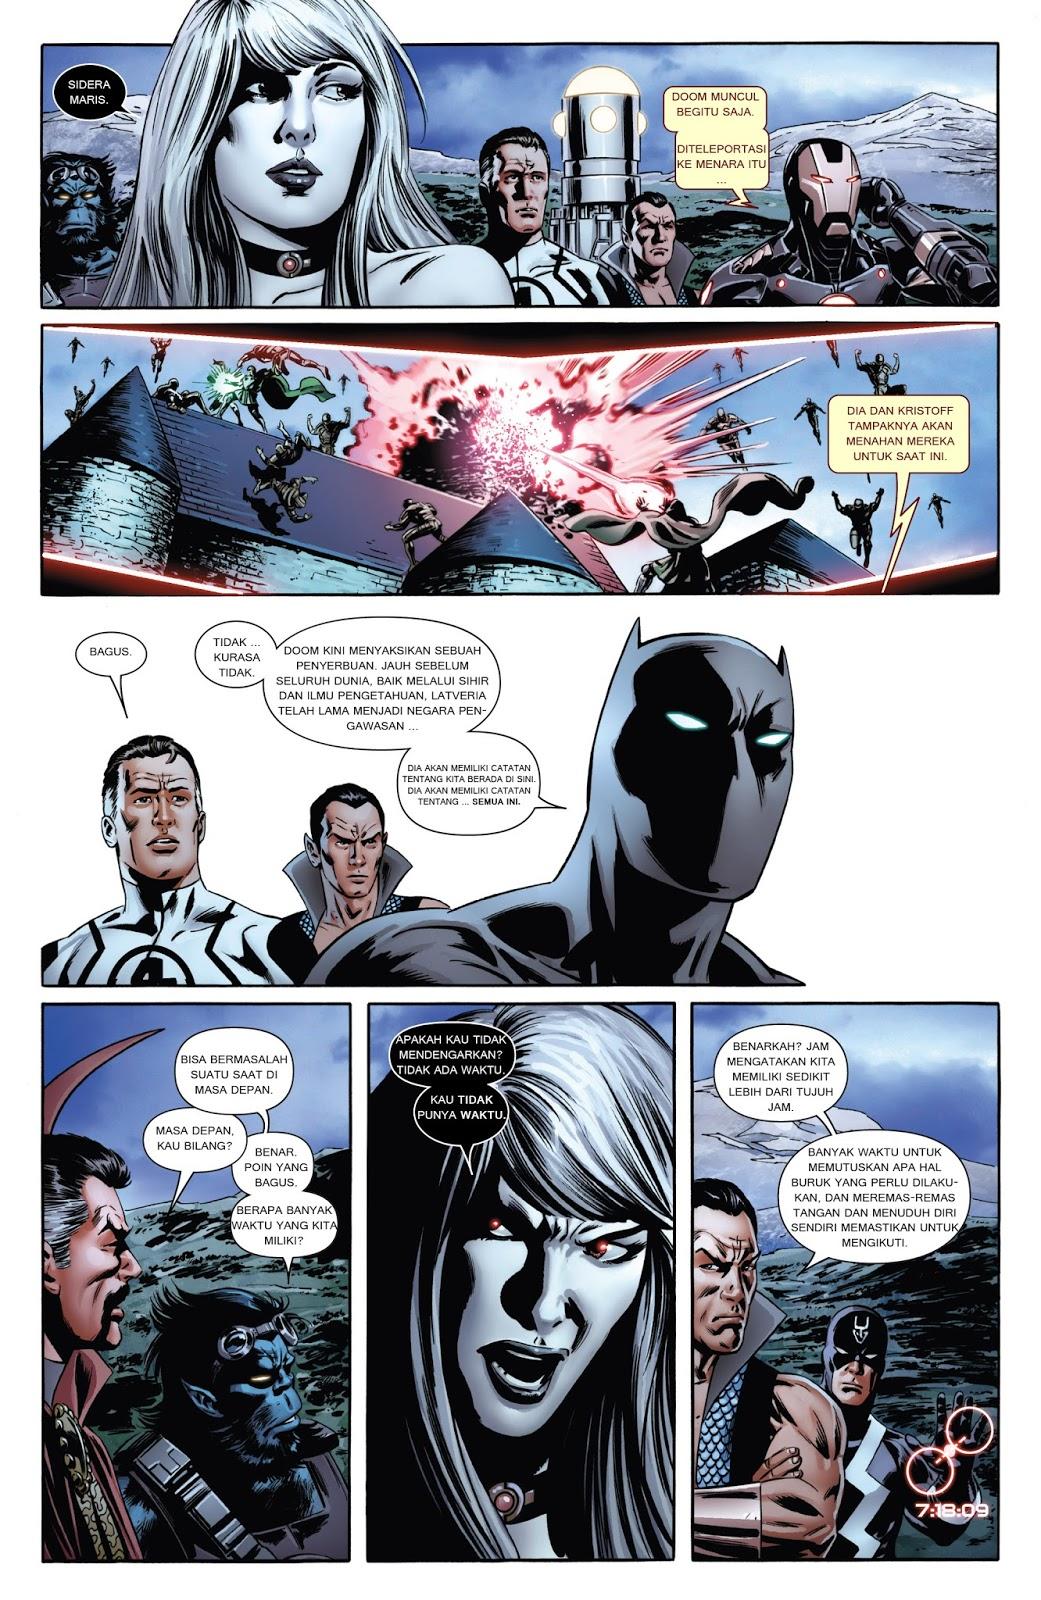 komik amerika bahasa indonesia: new avengers #6